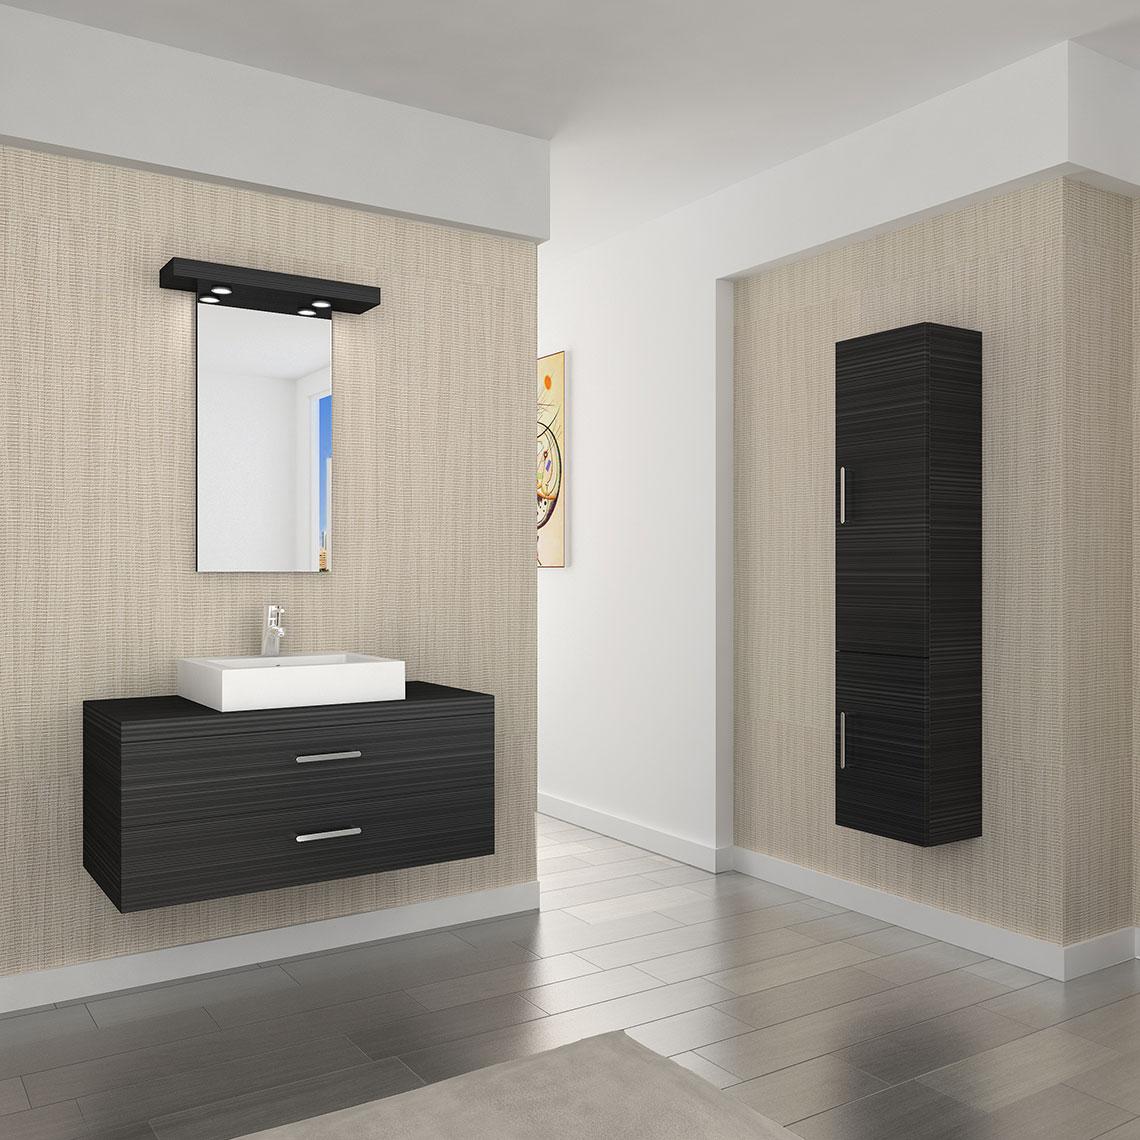 100-modelo-mueble-baño-fabricante-cuarto-baño-viberco-seville | Viberco